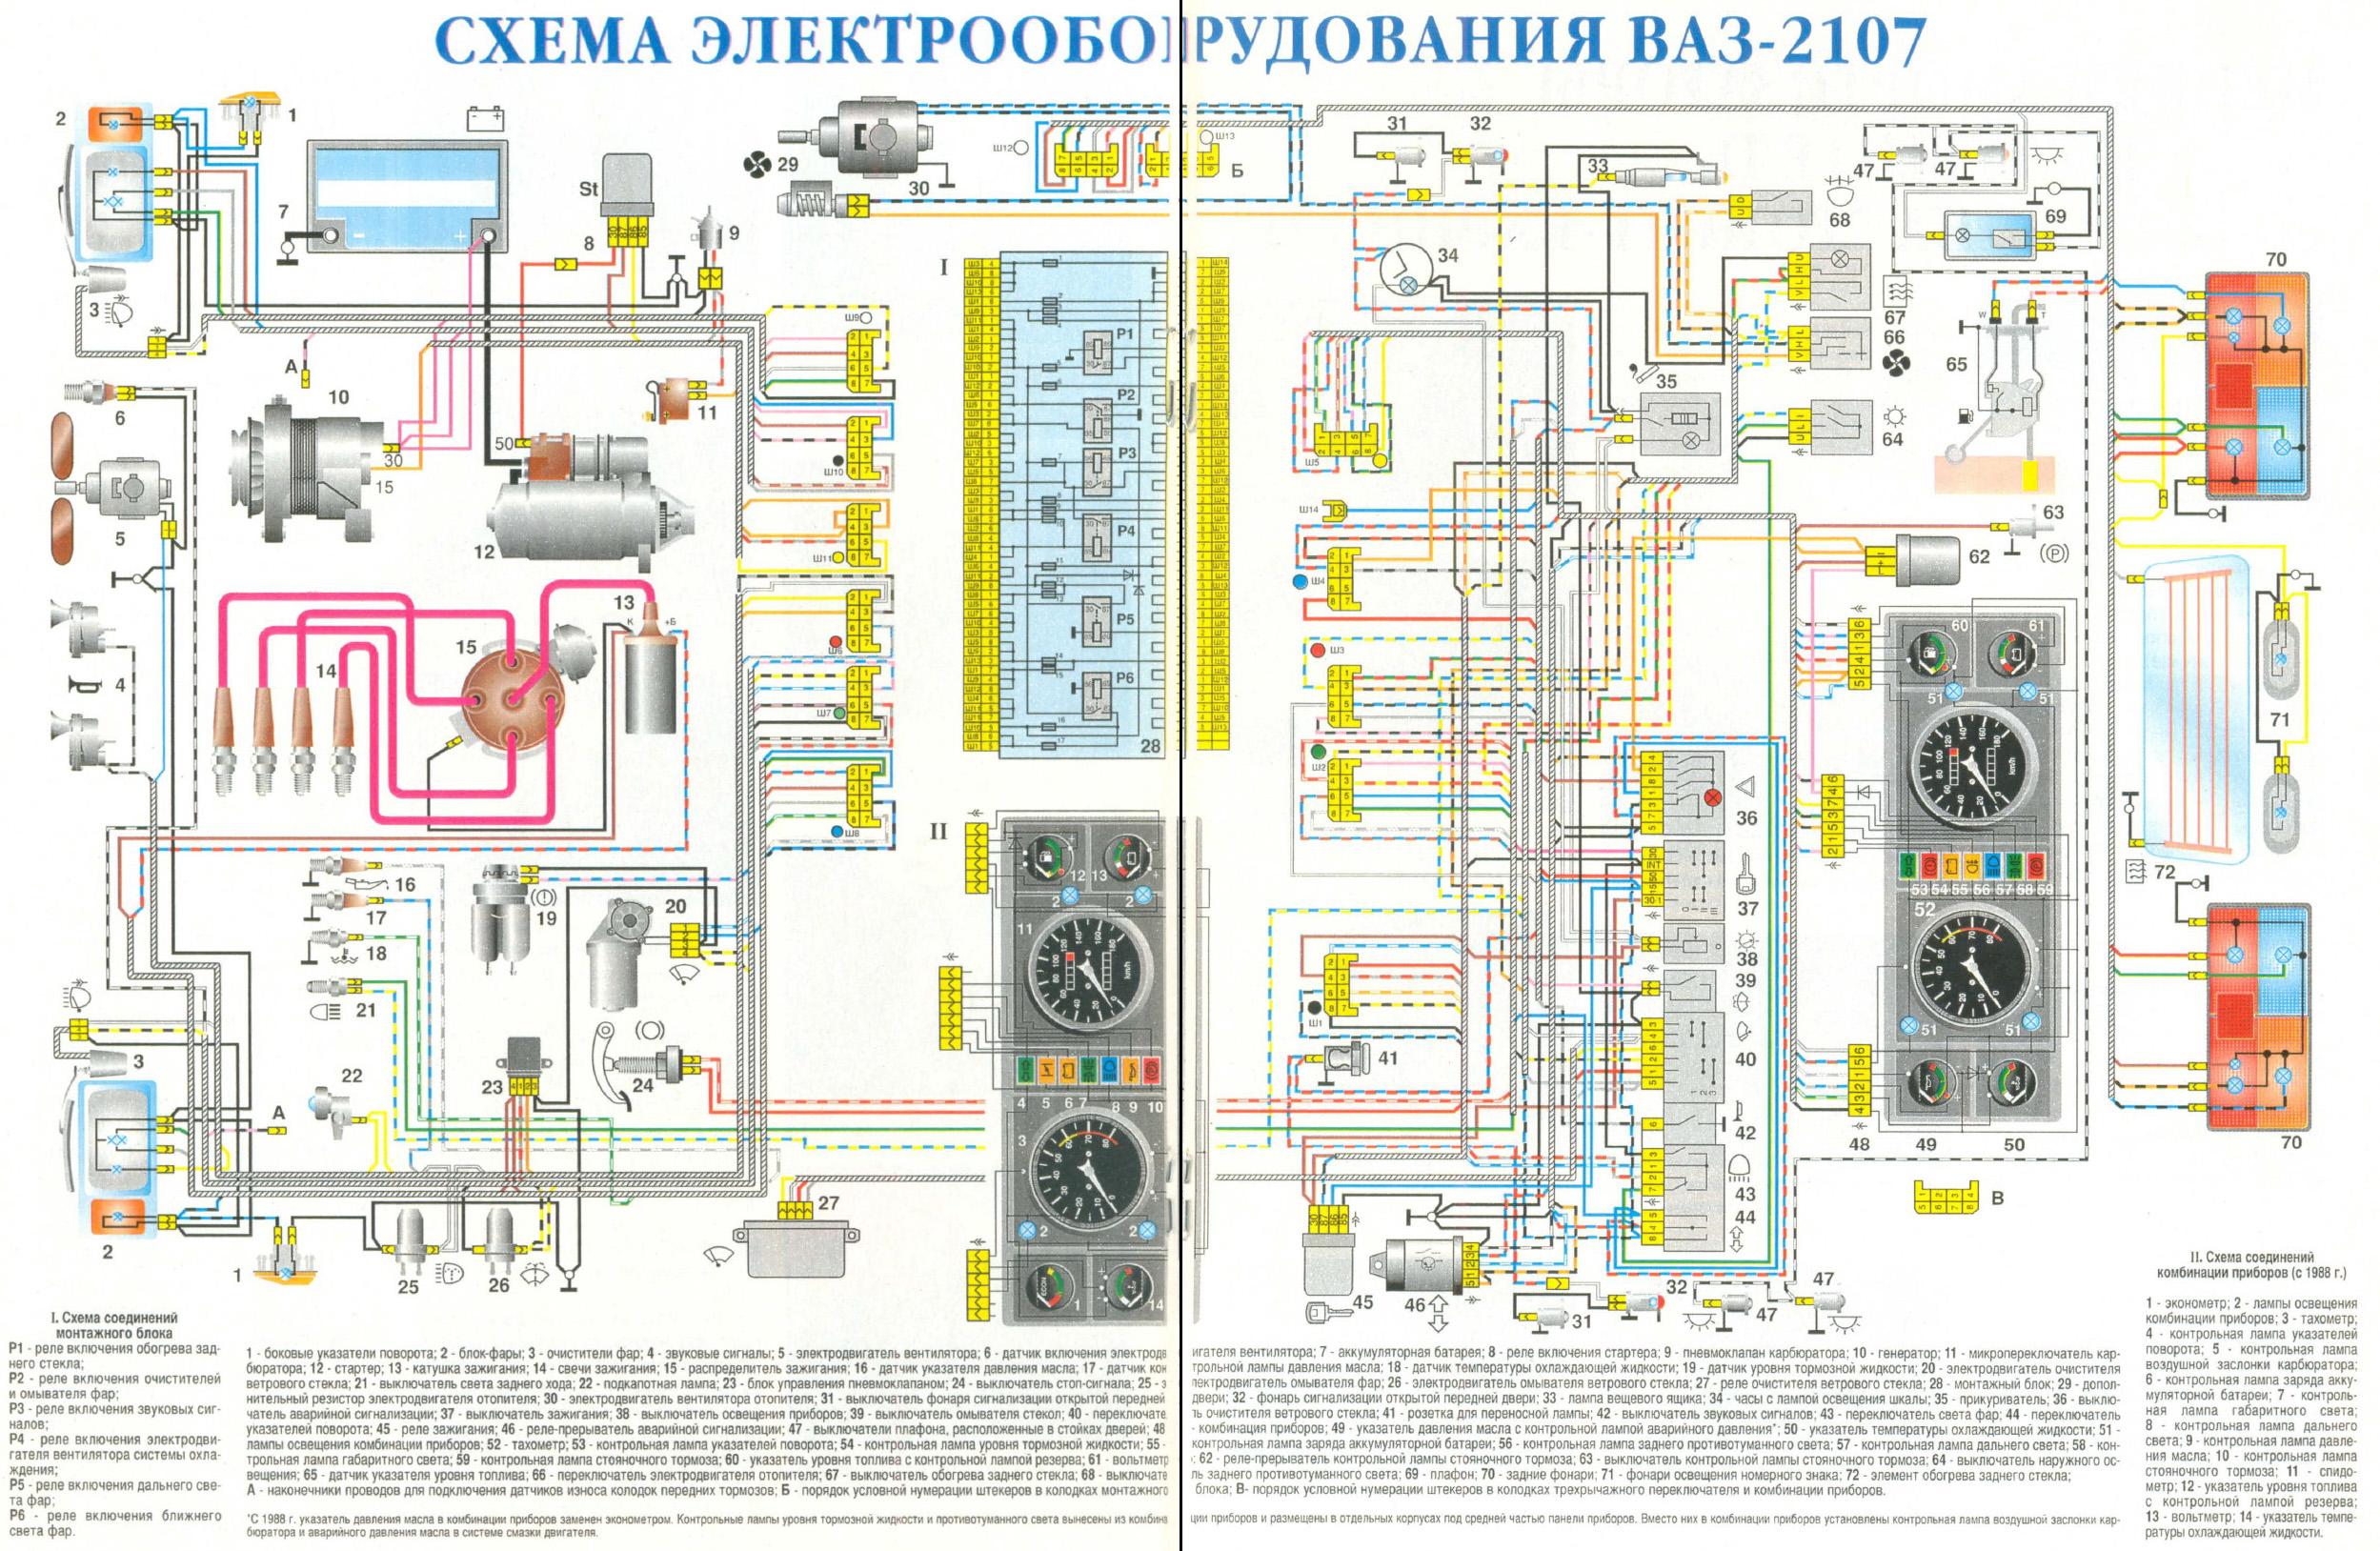 07 лада тормозные провода схема